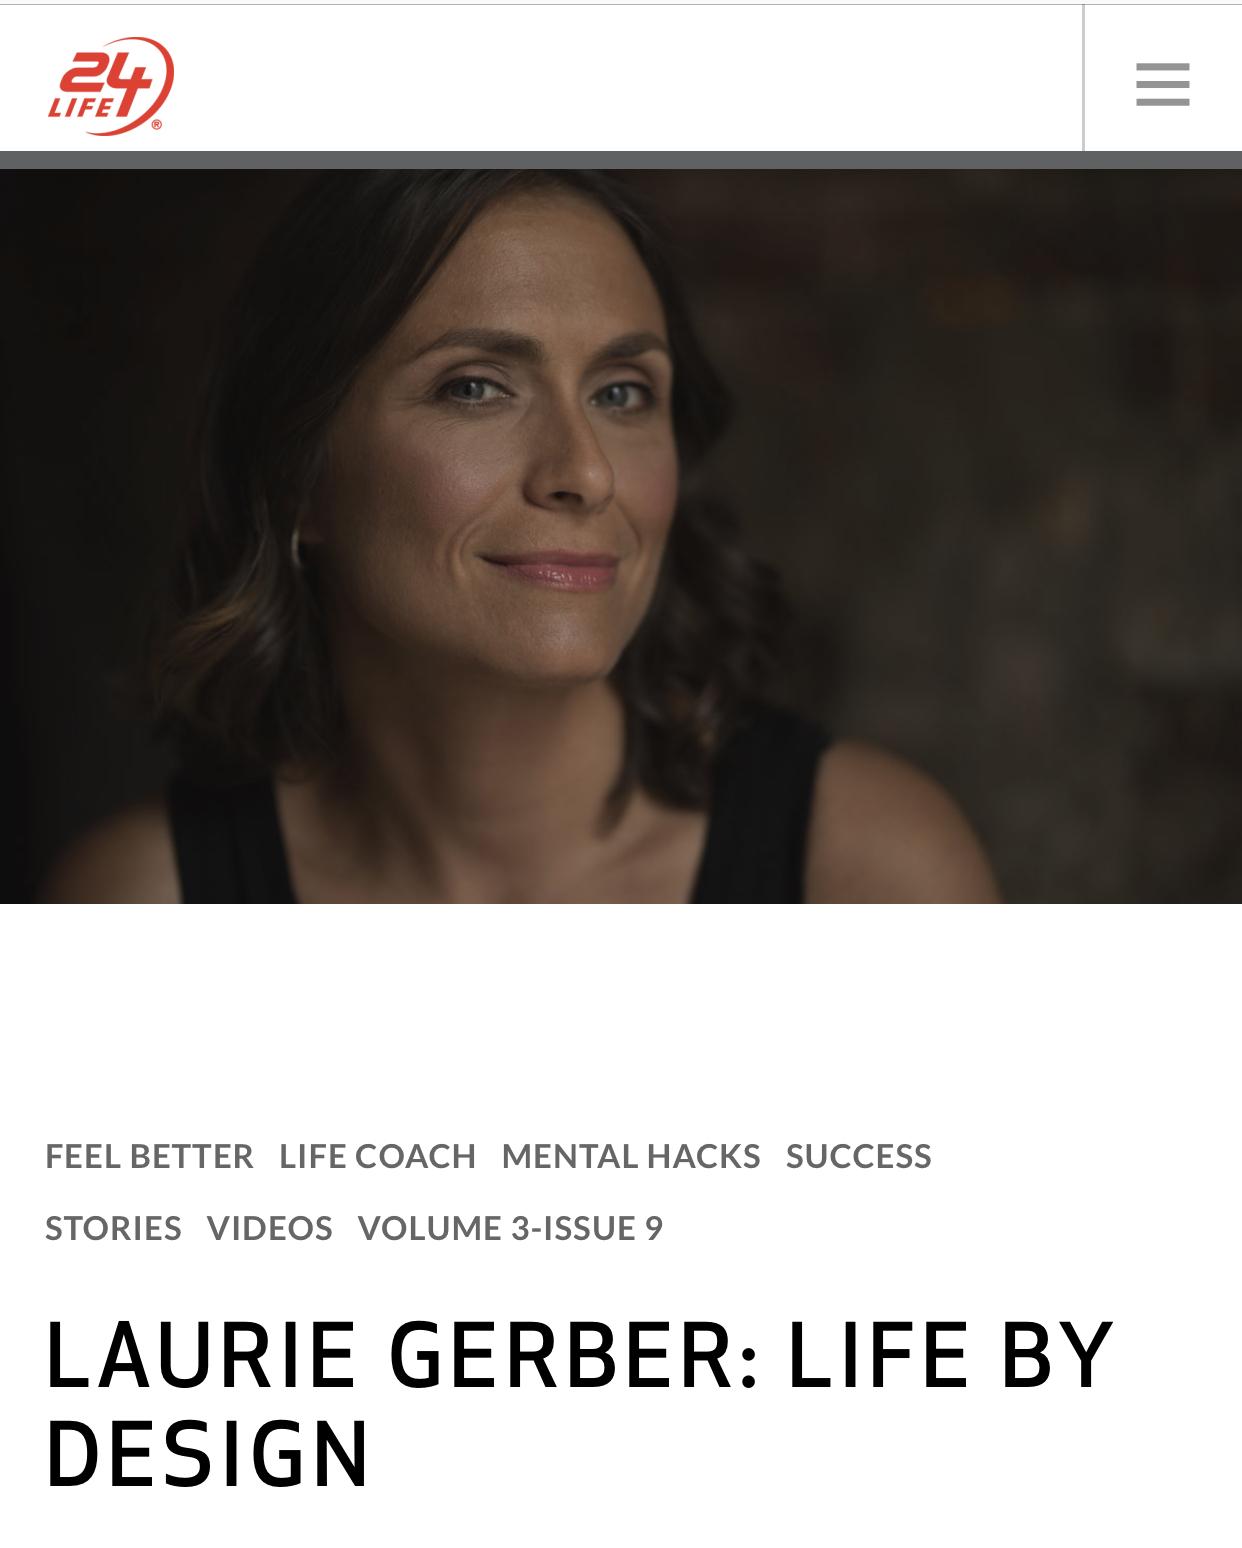 24 Life Magazine